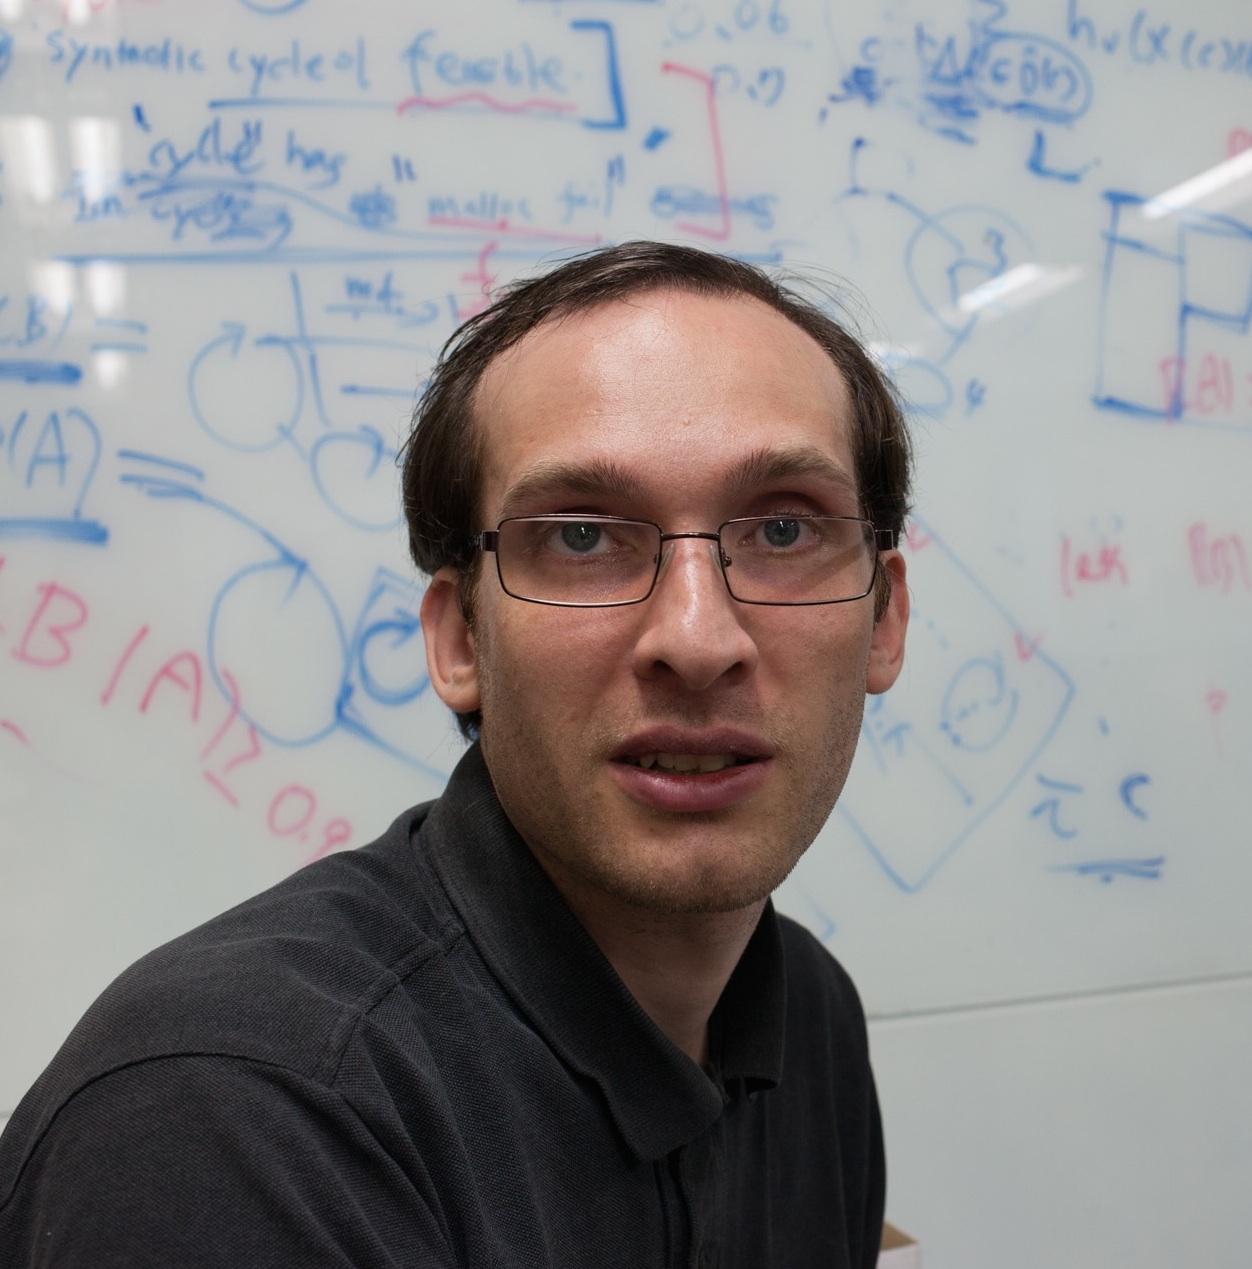 Xavier Rival : Research Scientist, INRIA